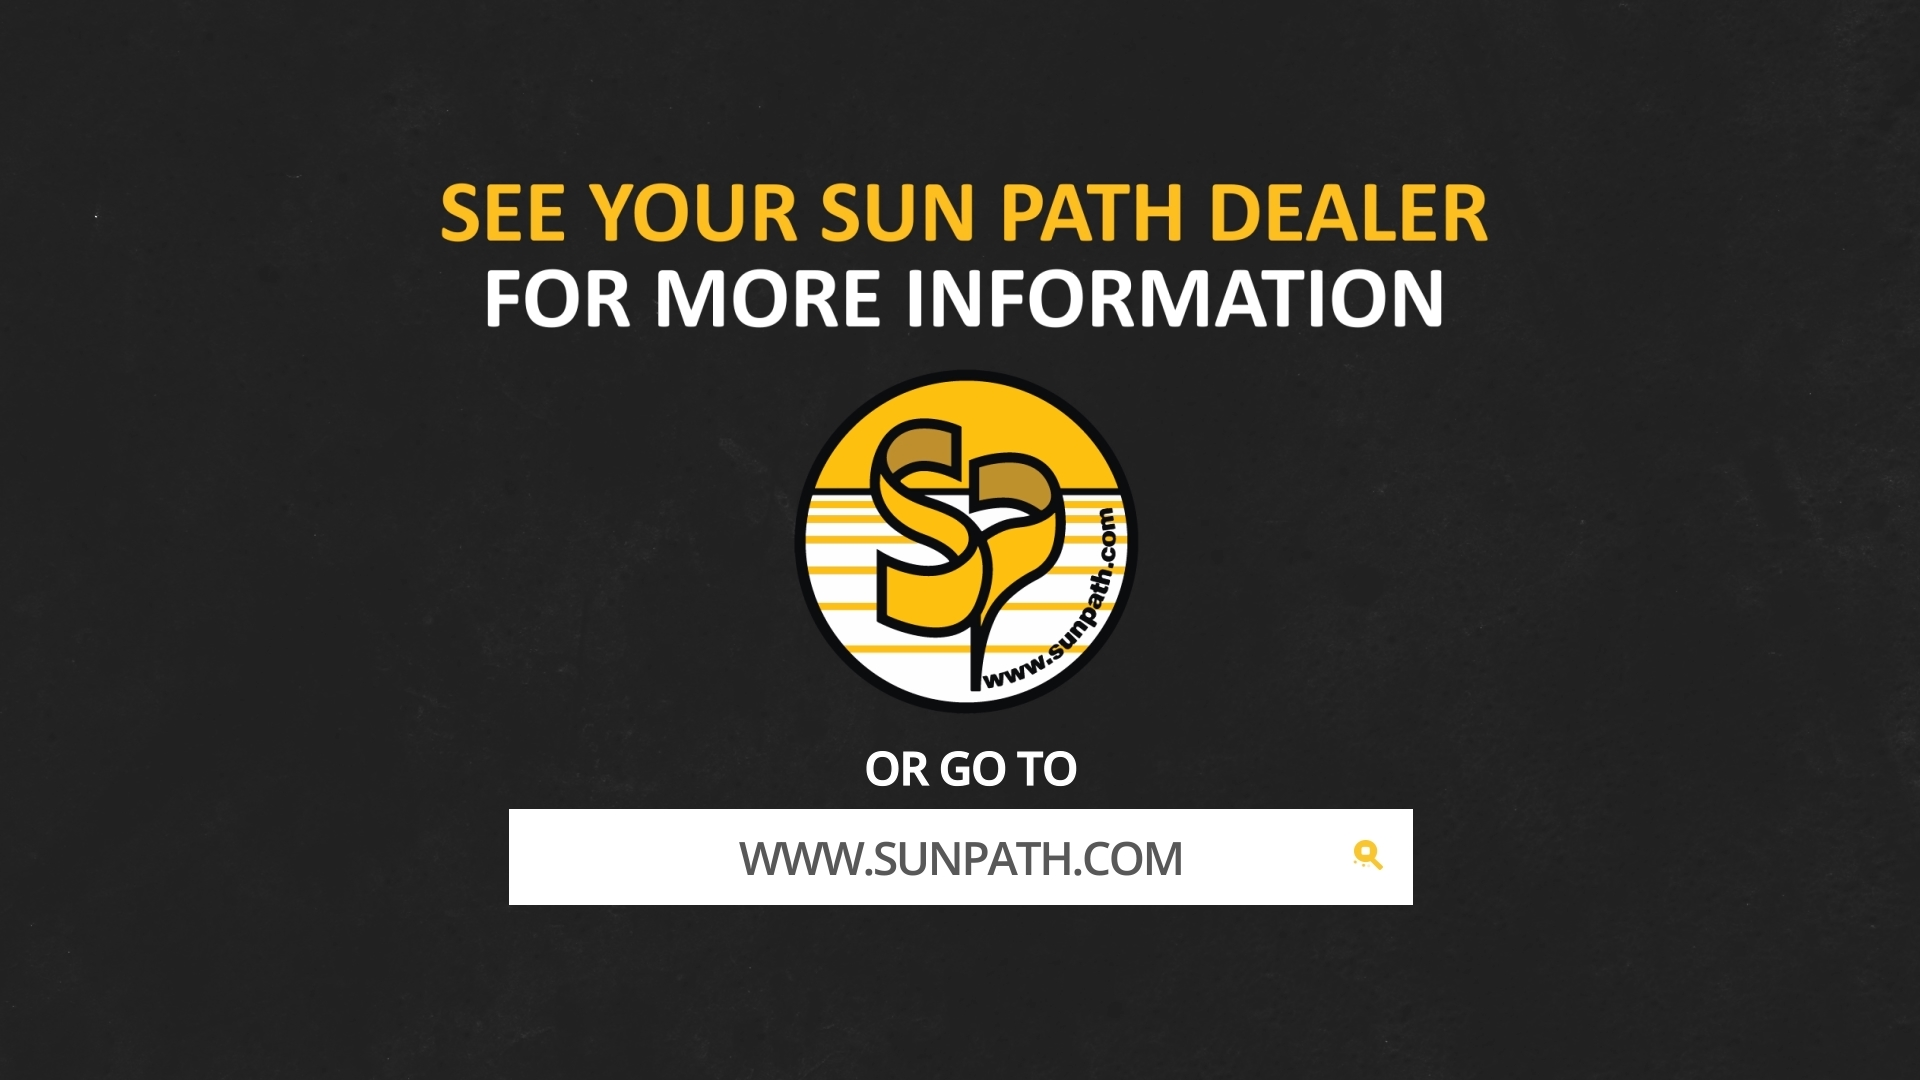 sunpathcommercial-final